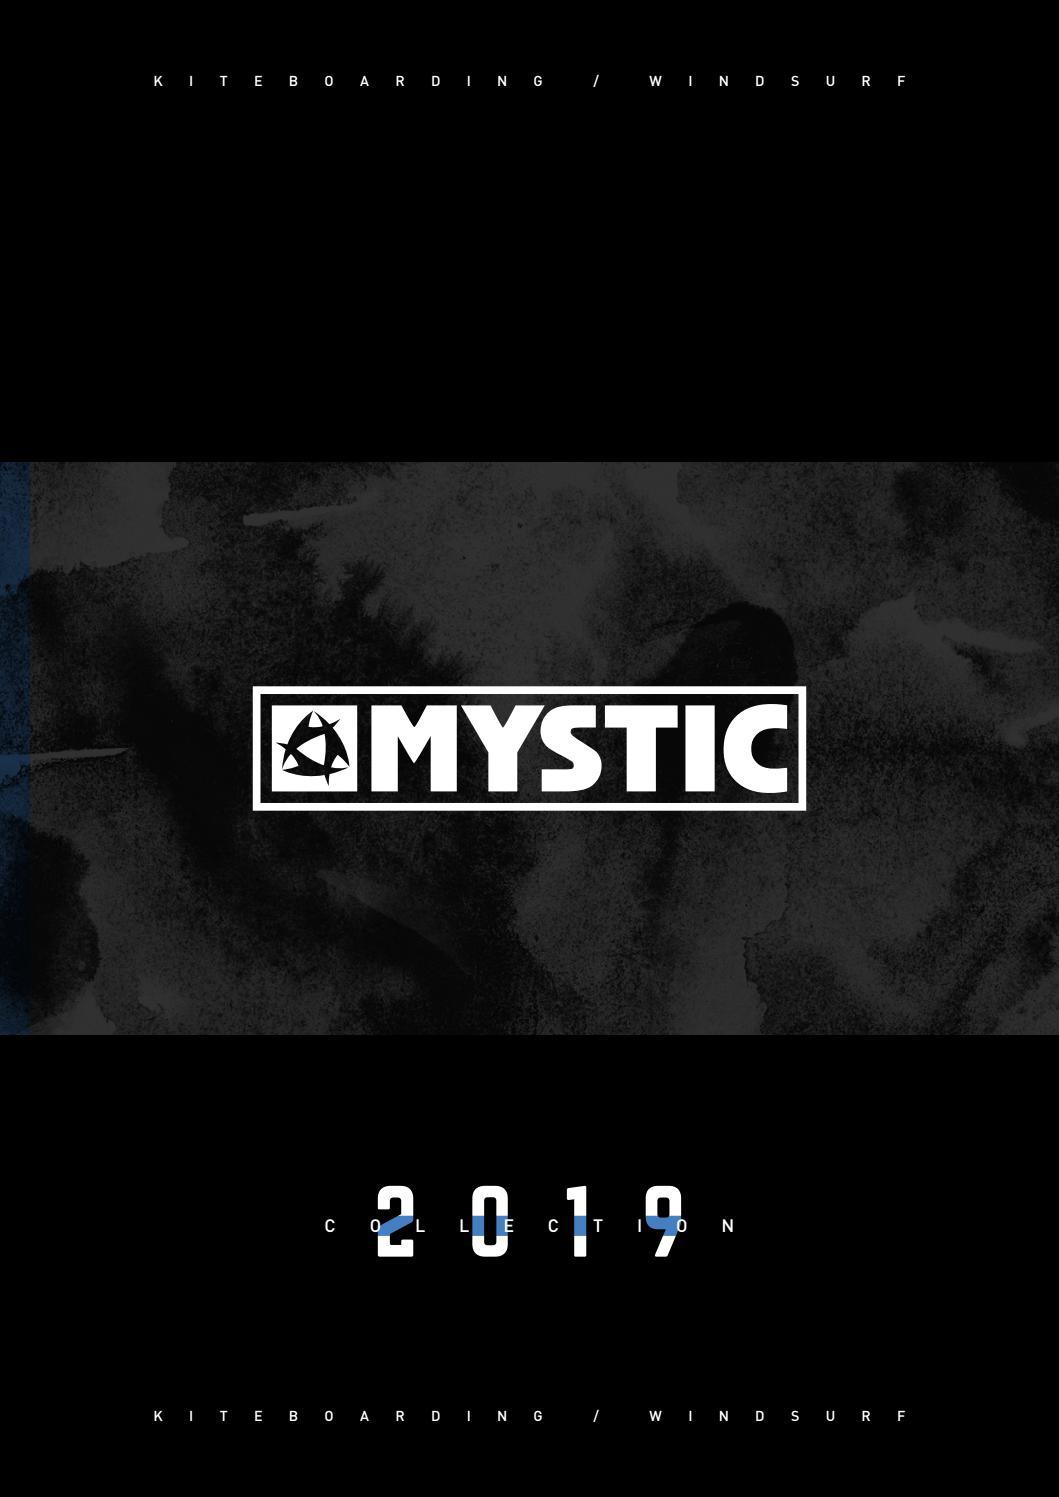 Black Windsurf Impact Vest 2019 Mystic STAR Kite